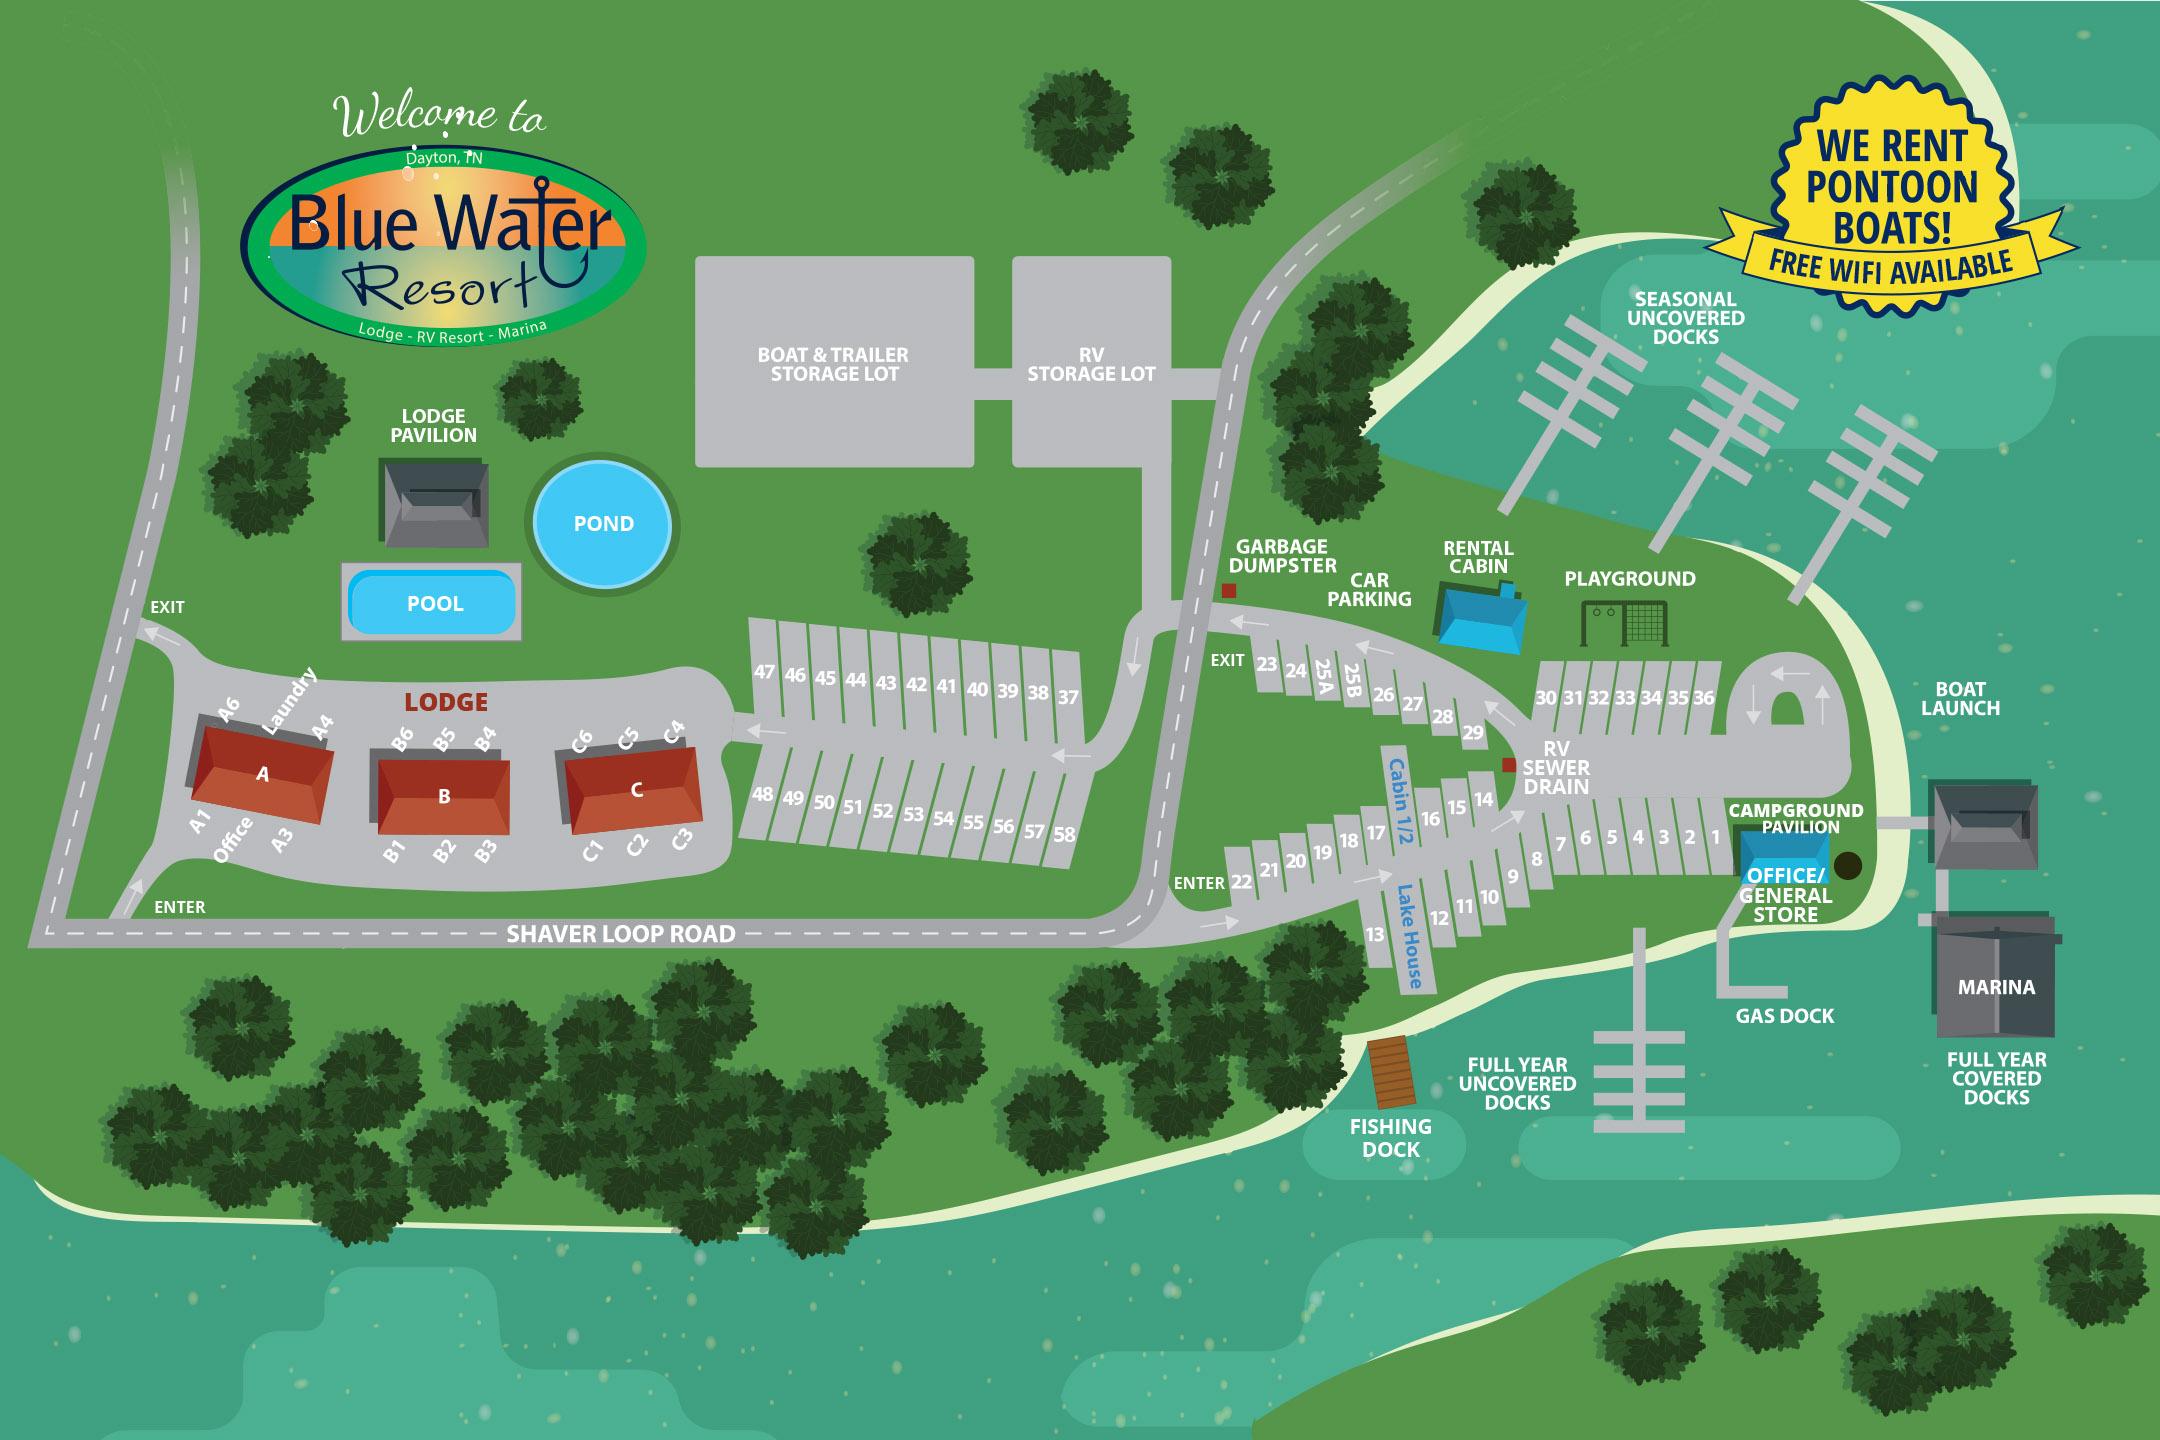 Blue Water Lodge RV Resort Property Map Dayton, TN